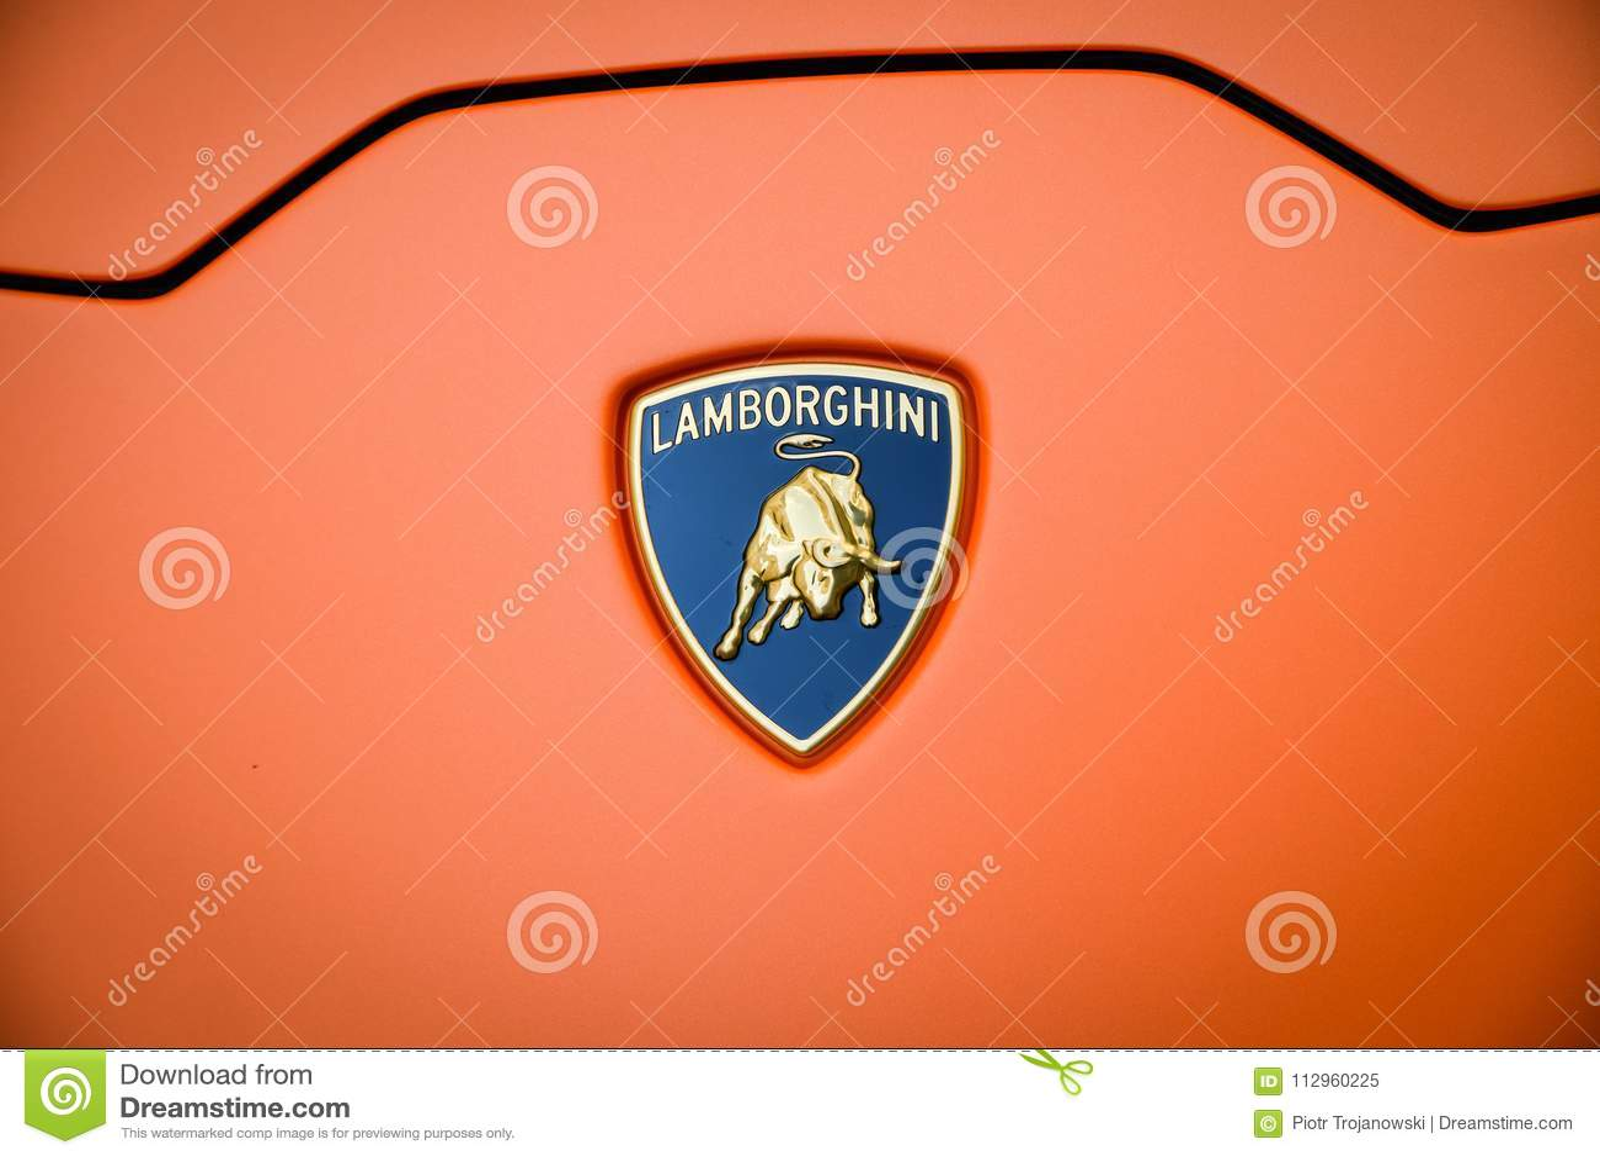 Milan Italy September 24 2017 Lamborghini Car In Montenapo